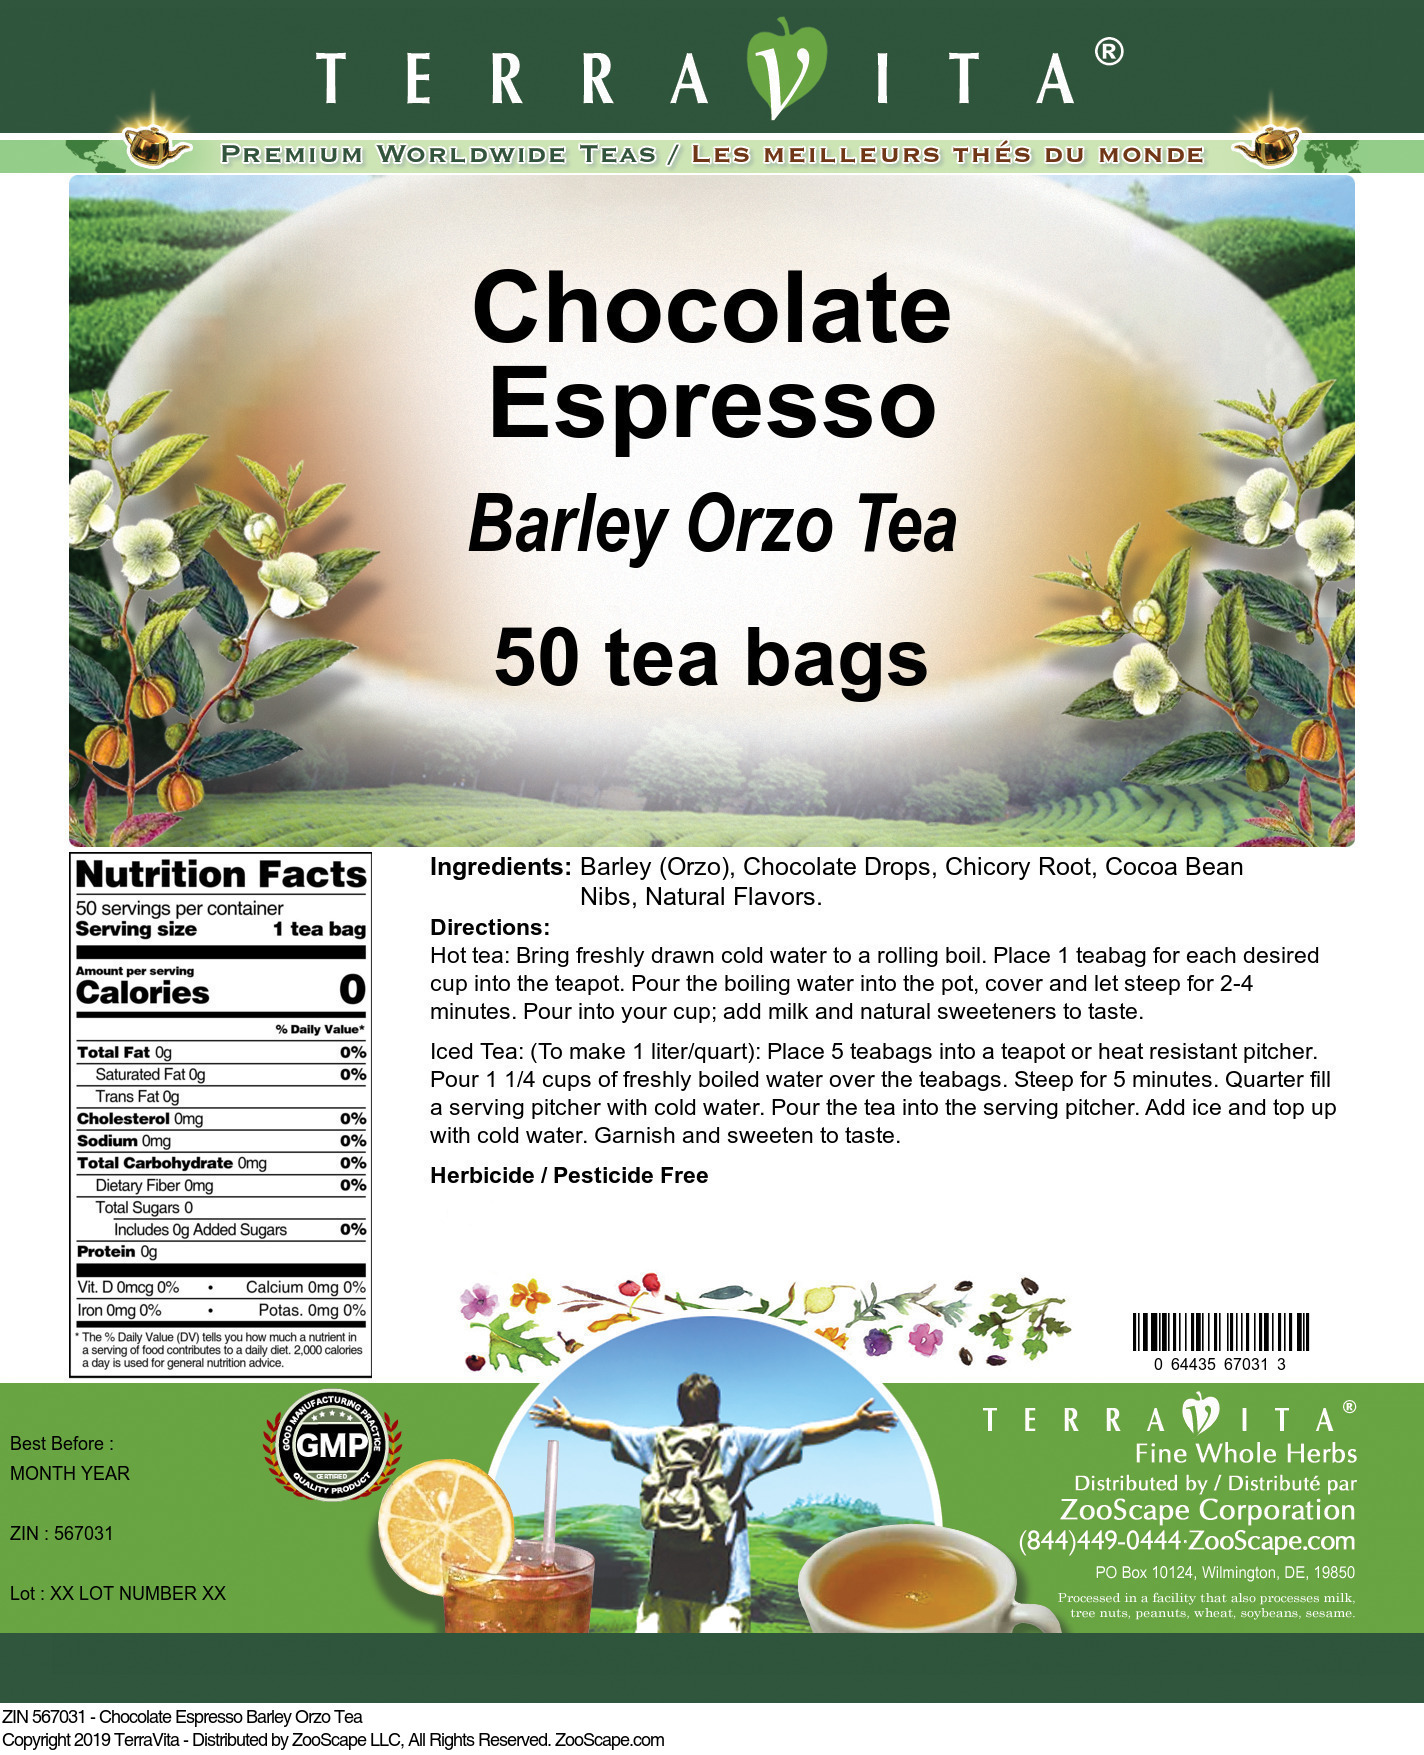 Chocolate Espresso Barley Orzo